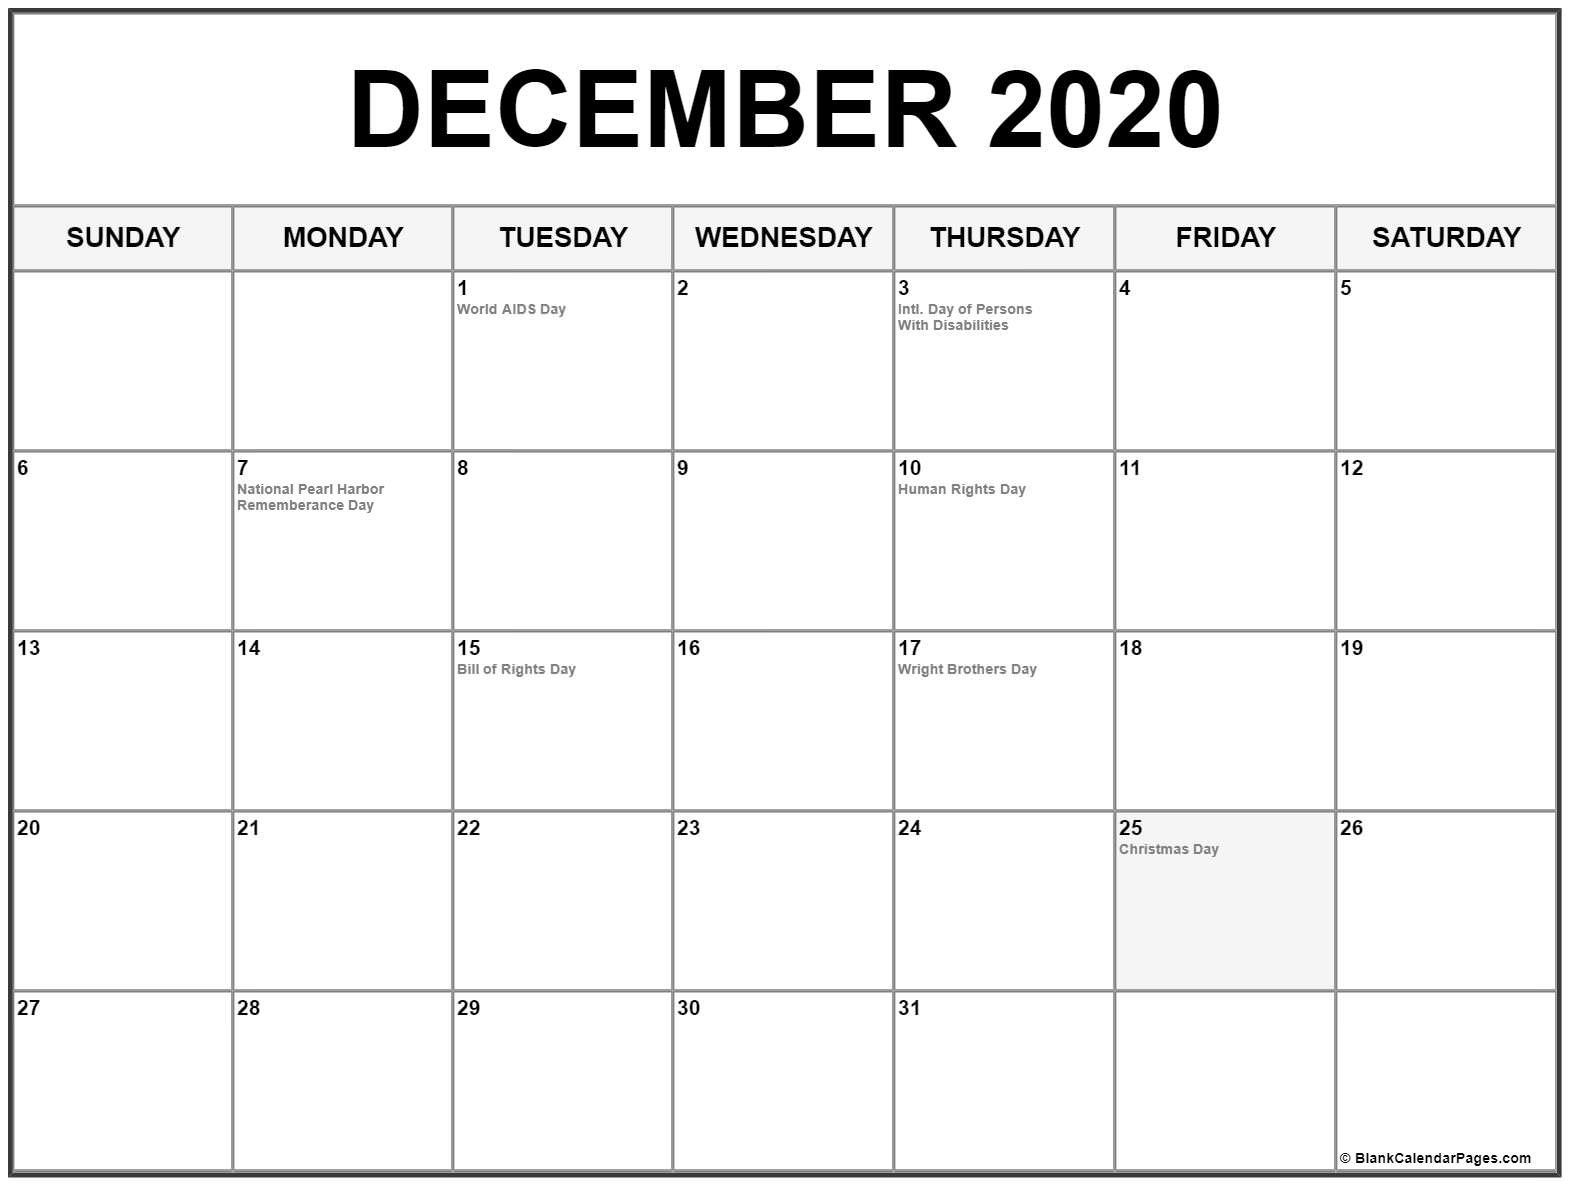 December Calendar 2020  Bolan.horizonconsulting.co for Calander December 2020